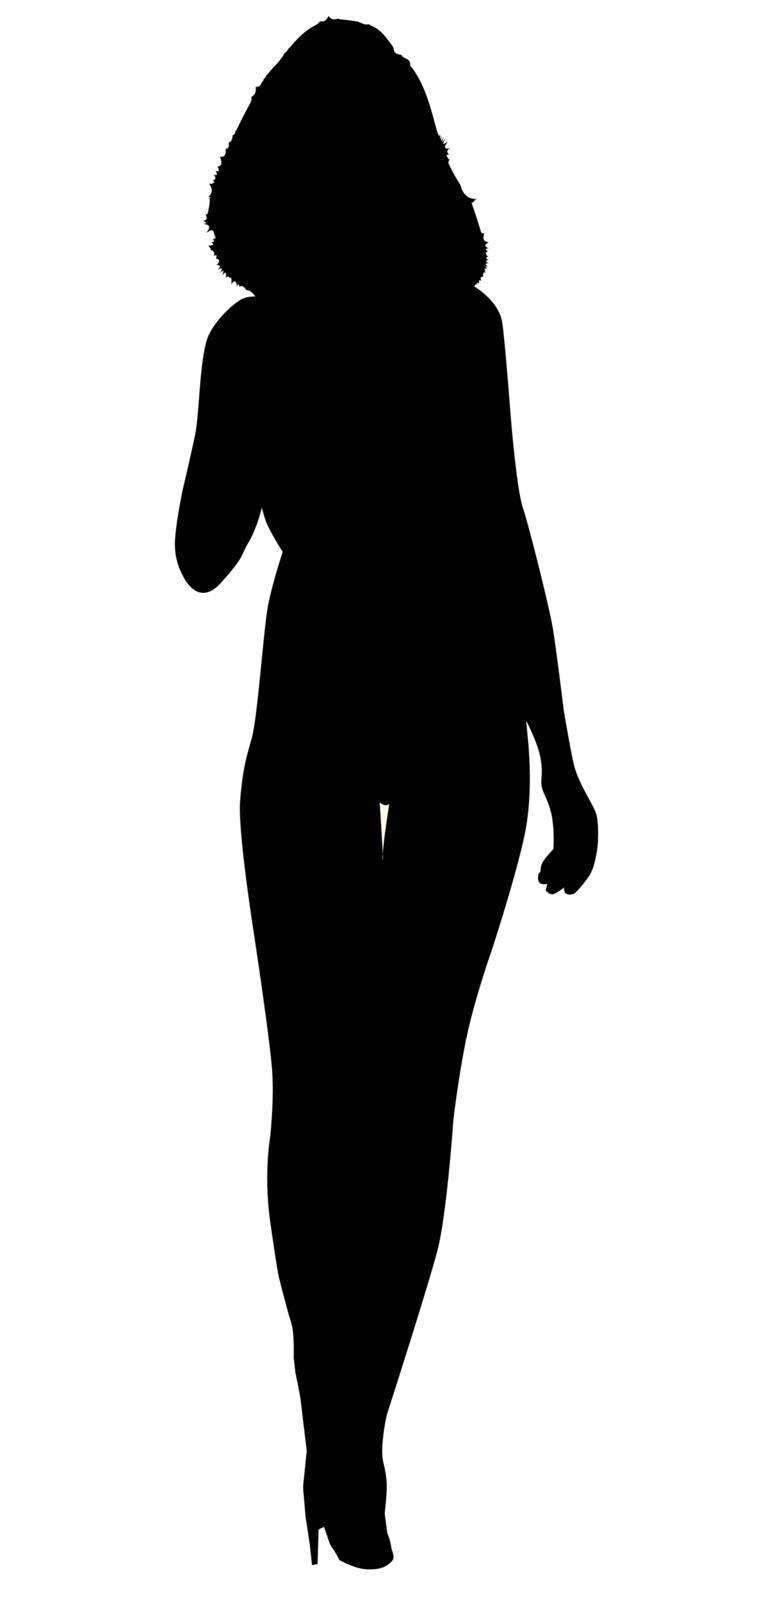 Silhouette of a girl wearing stiletto heels